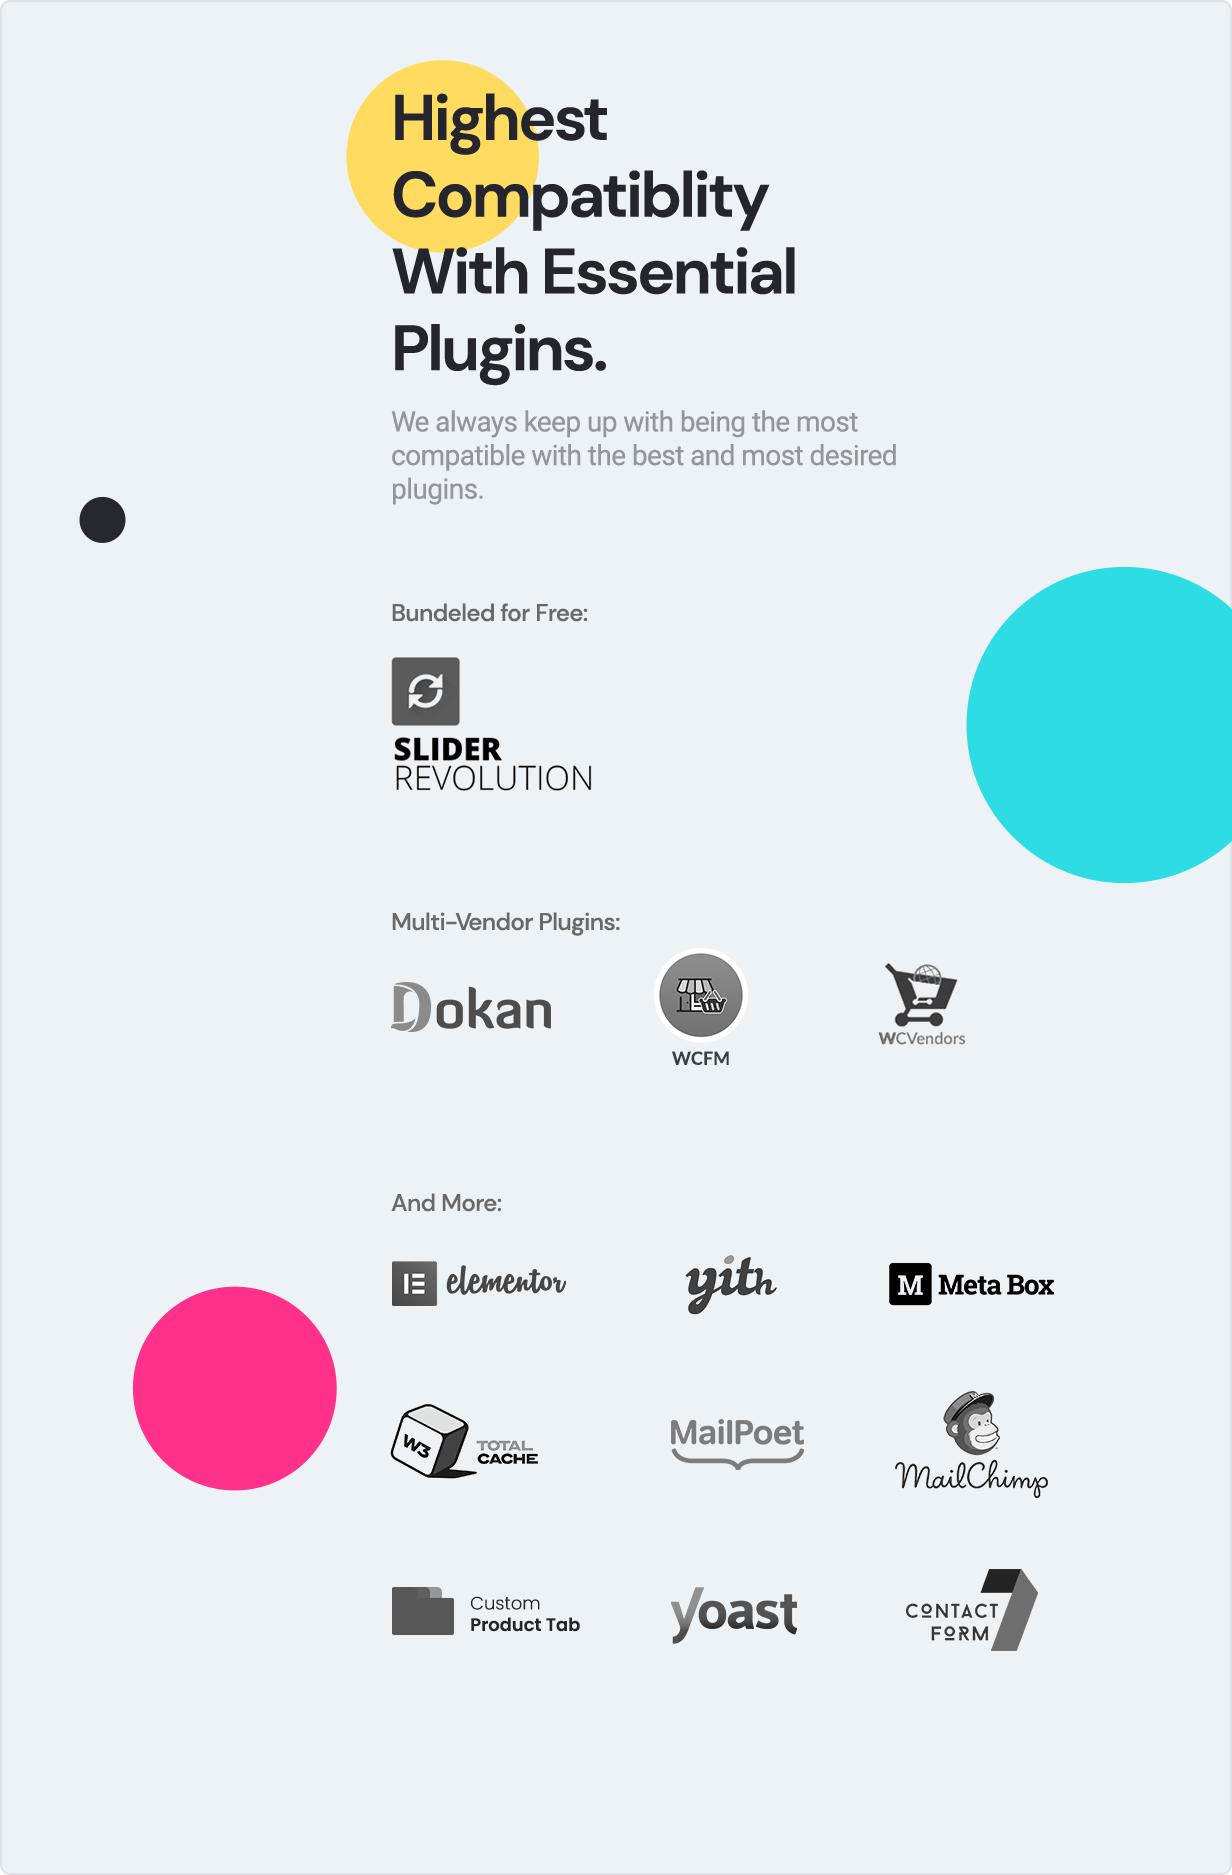 teta - WooCommerce WordPress Theme - Compatibility Plugins